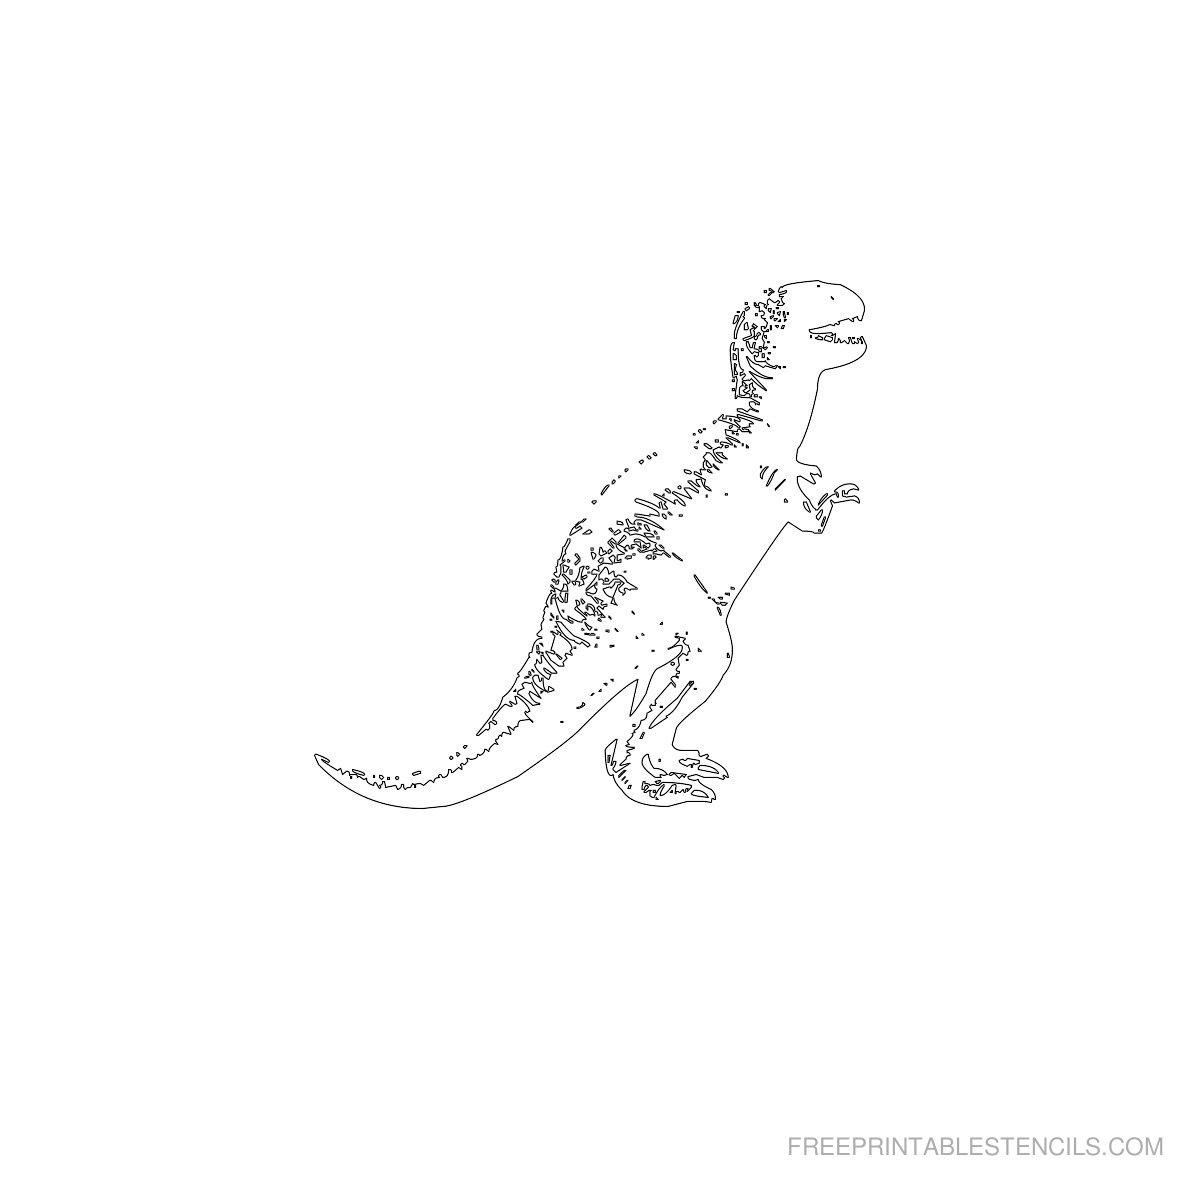 Free Printable Dinosaur Stencil S